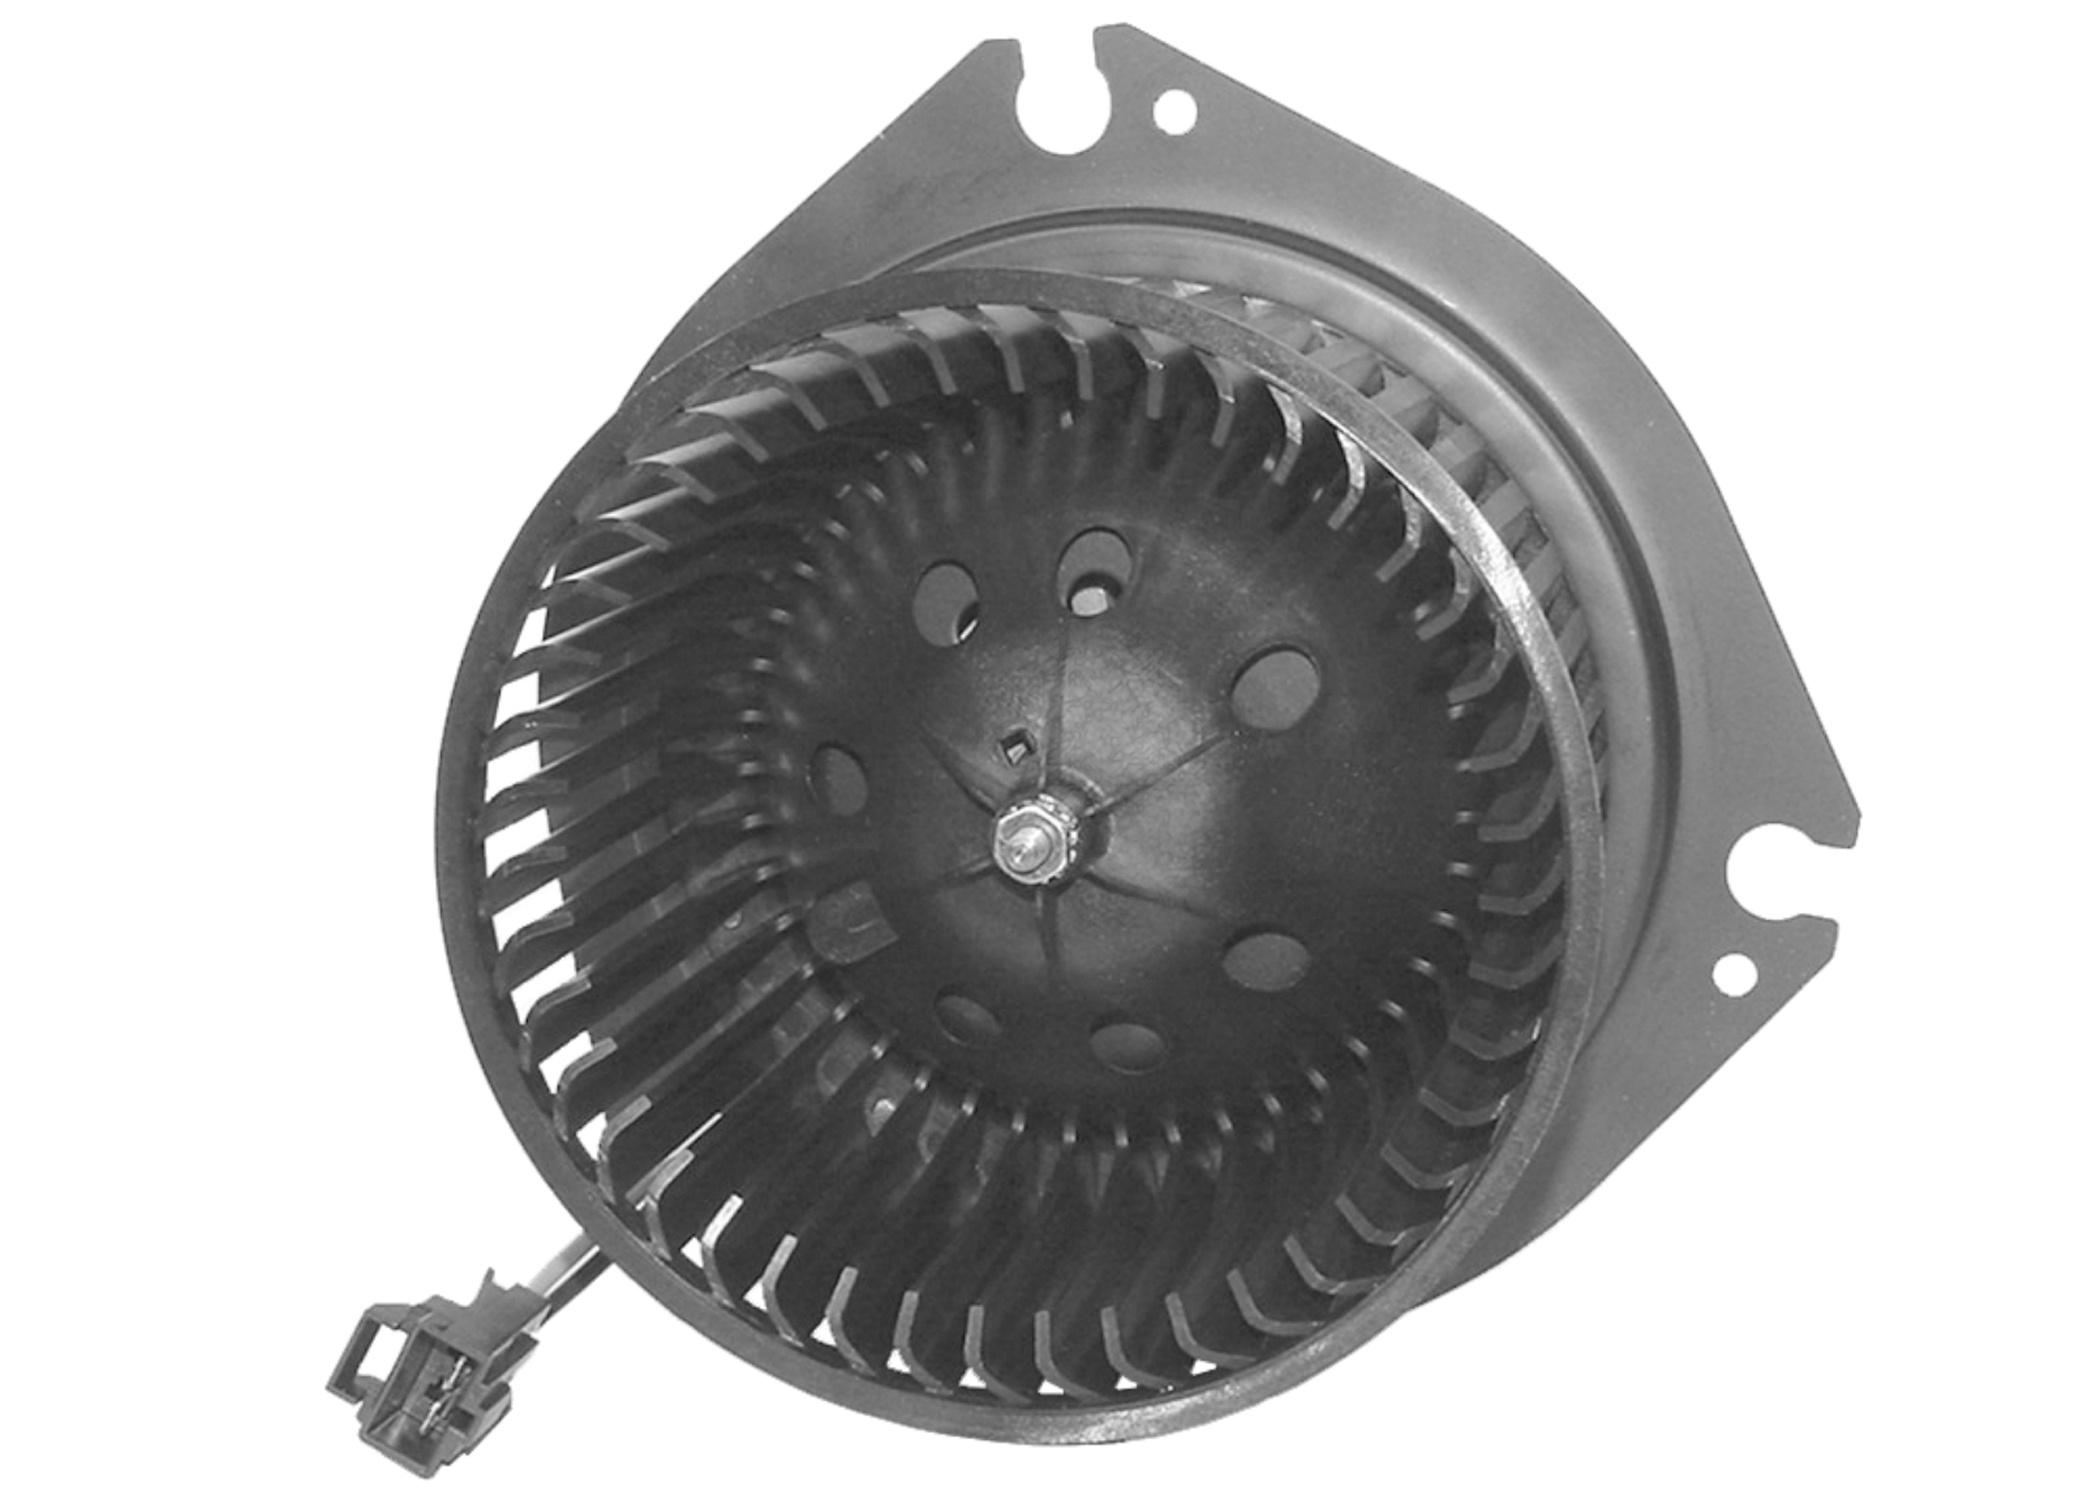 ACDELCO GM ORIGINAL EQUIPMENT - HVAC Blower Motor and Wheel - DCB 15-80669